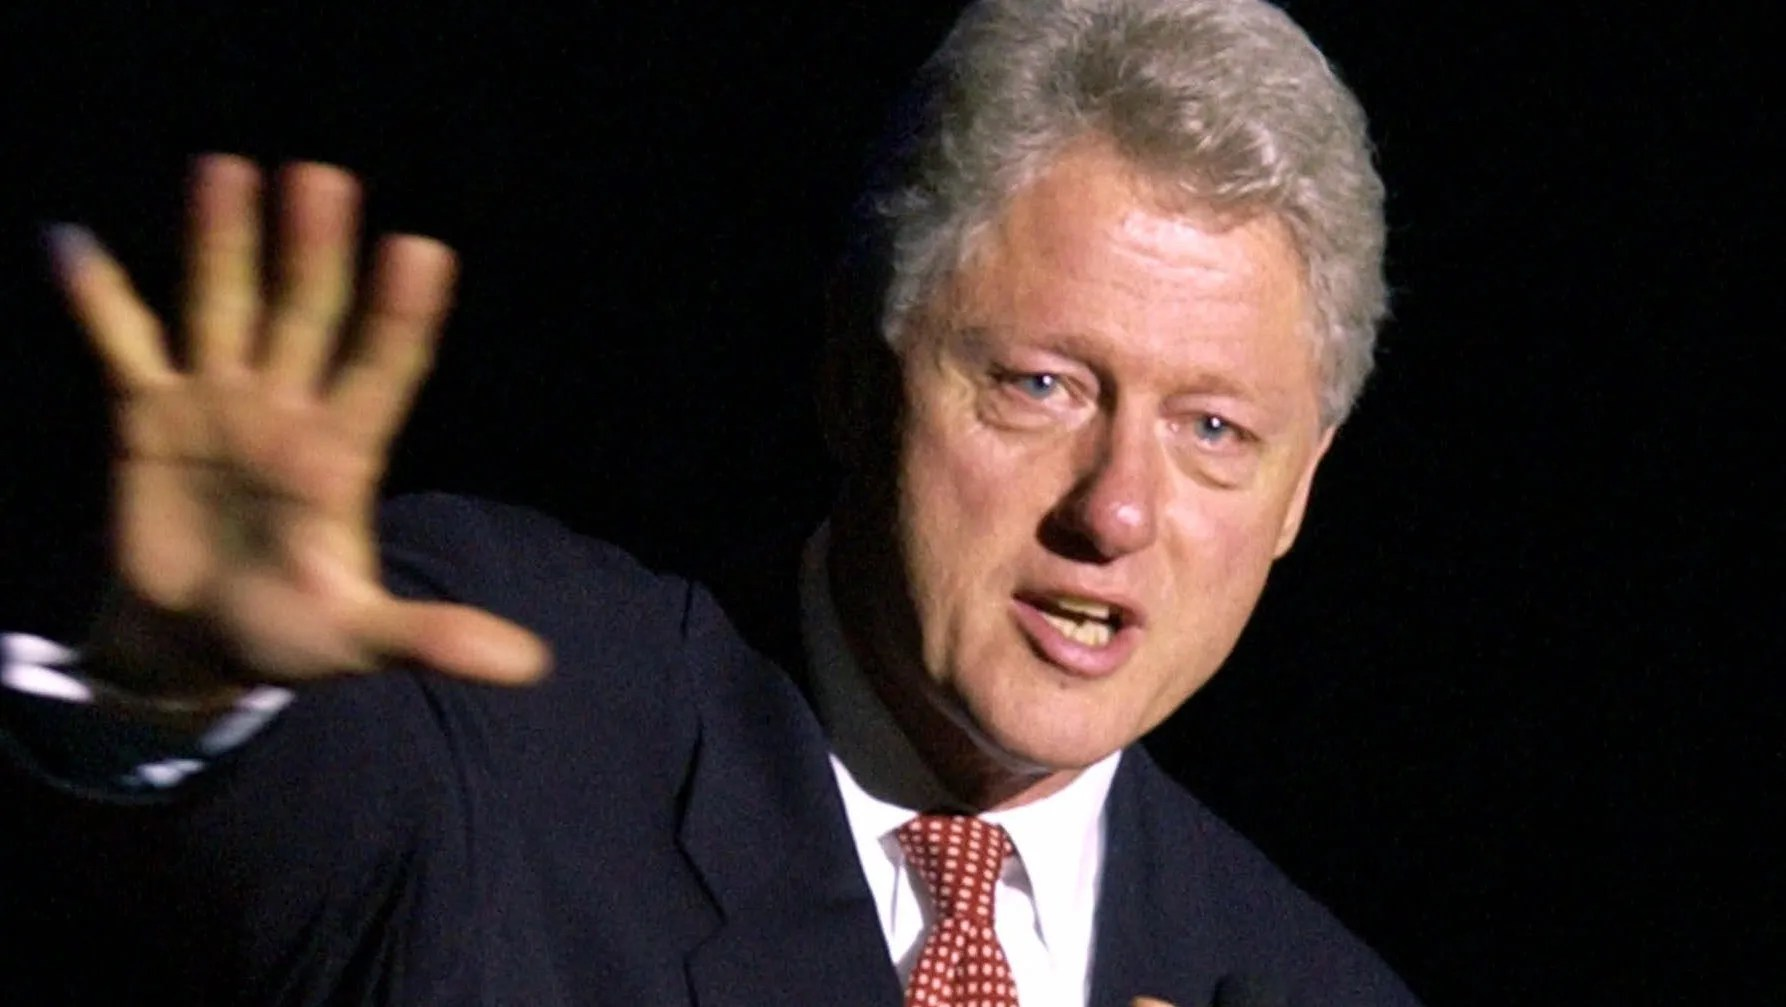 clinton in 2001 on